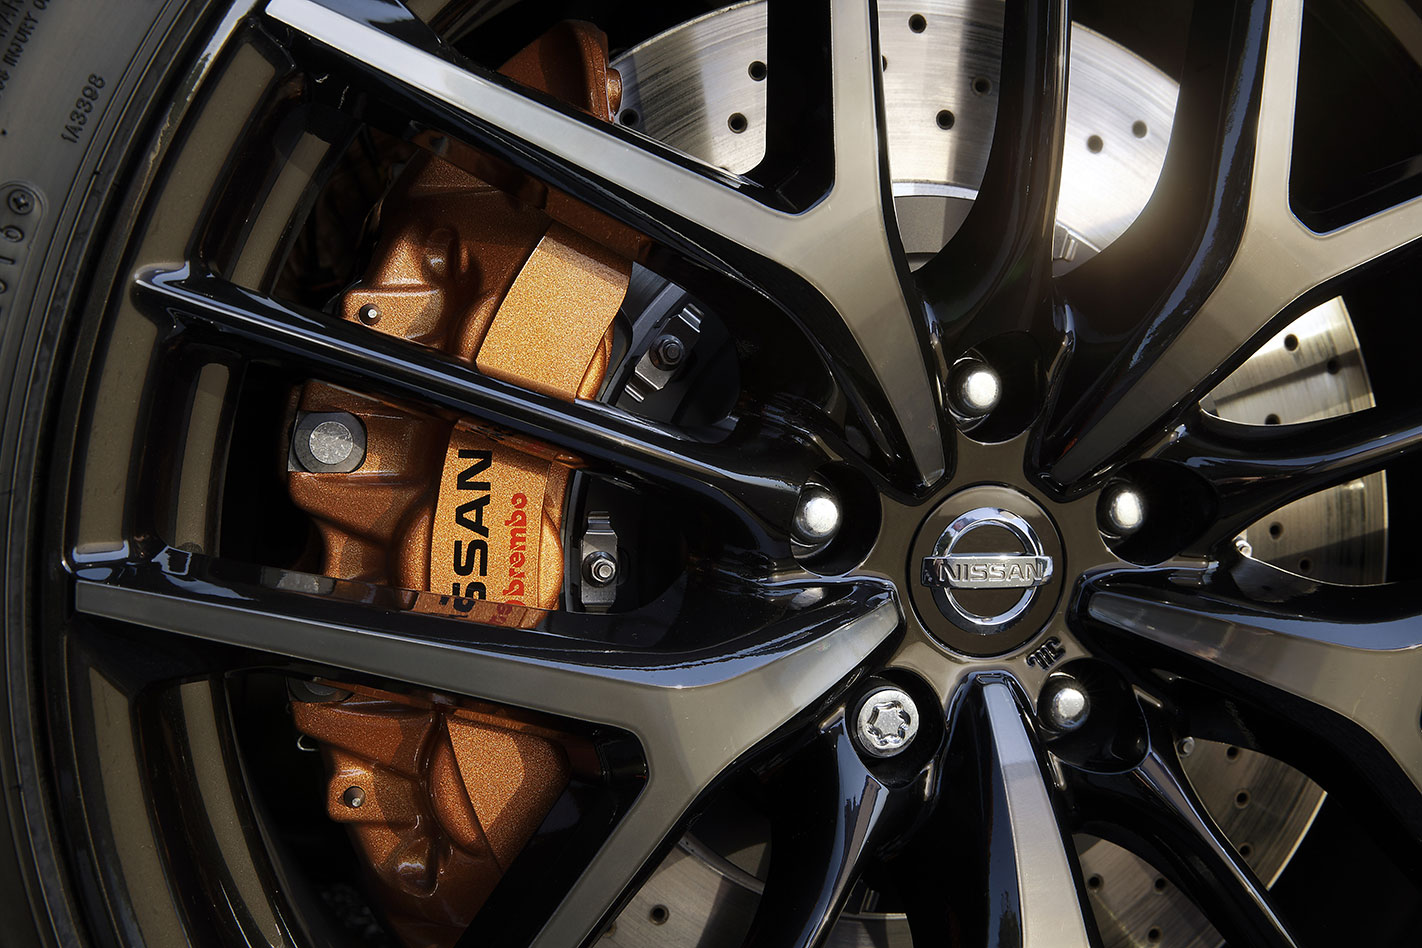 2017 Nissan GT-R brakes